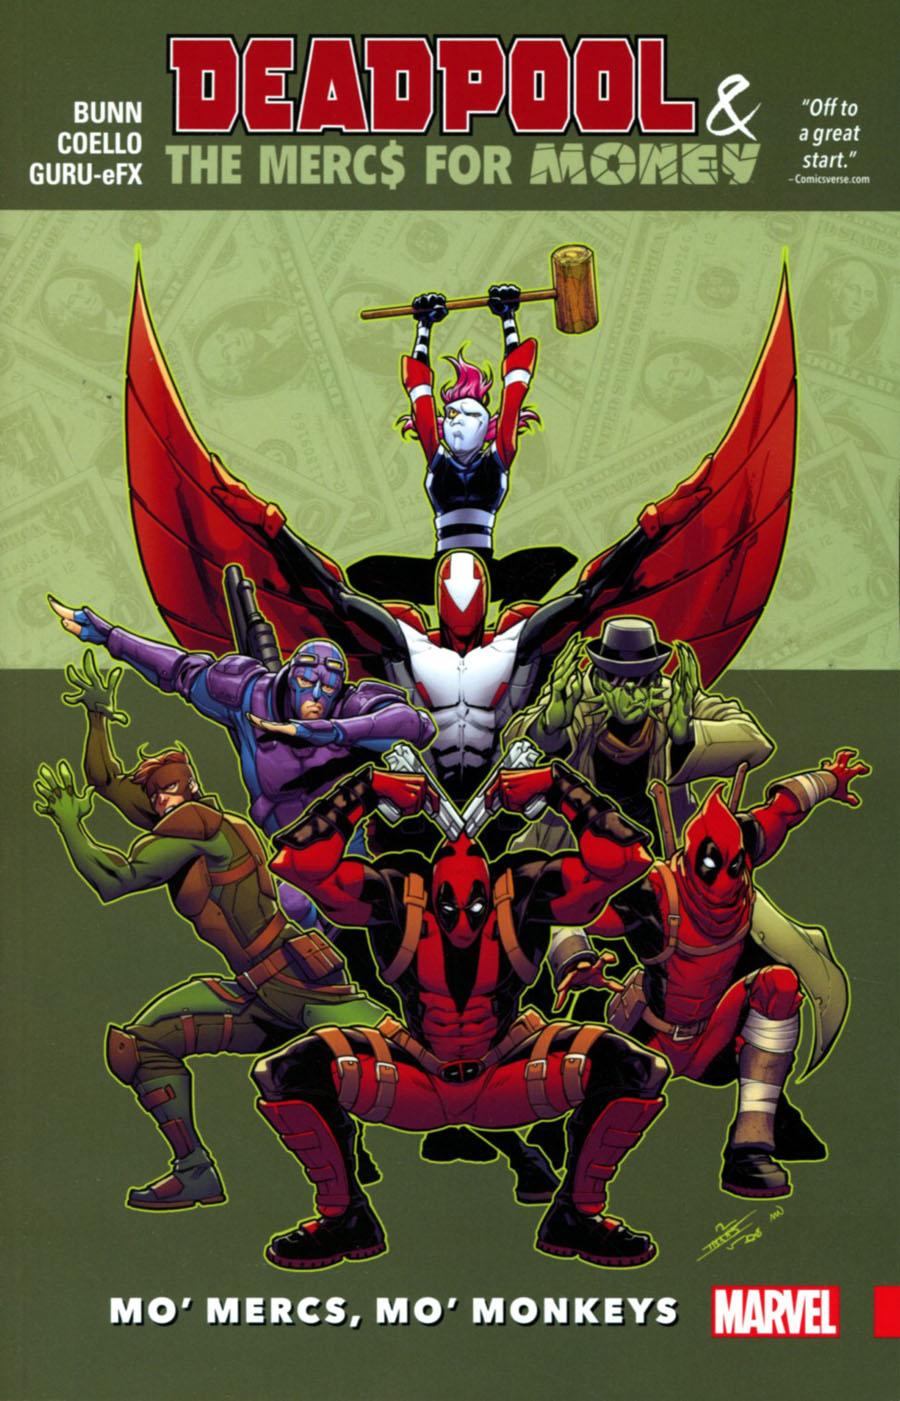 Deadpool And The Mercs For Money Vol 1 Mo Mercs Mo Monkeys TP